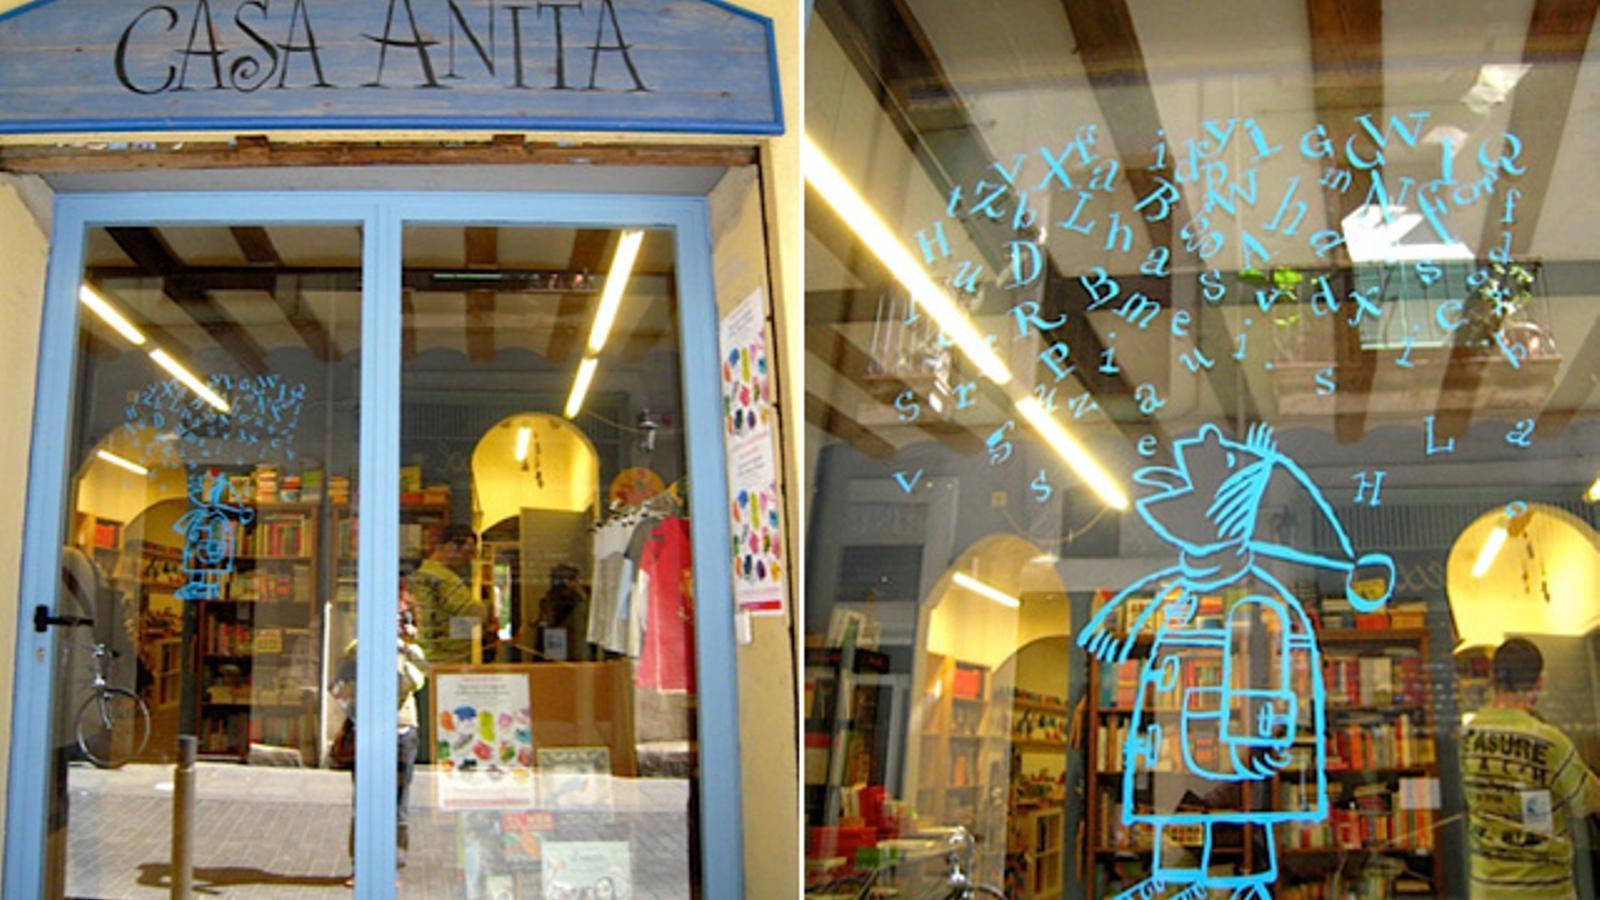 La llibreria gracienca Casa Anita denuncia que s vctima de mobbing immobiliari